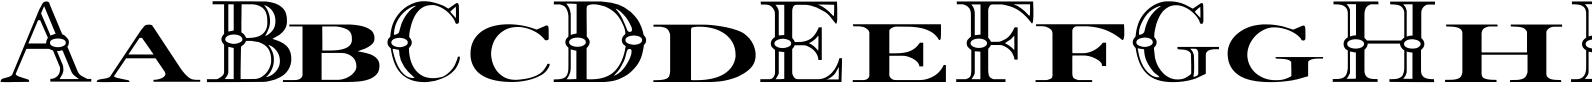 Fry's Alphabet